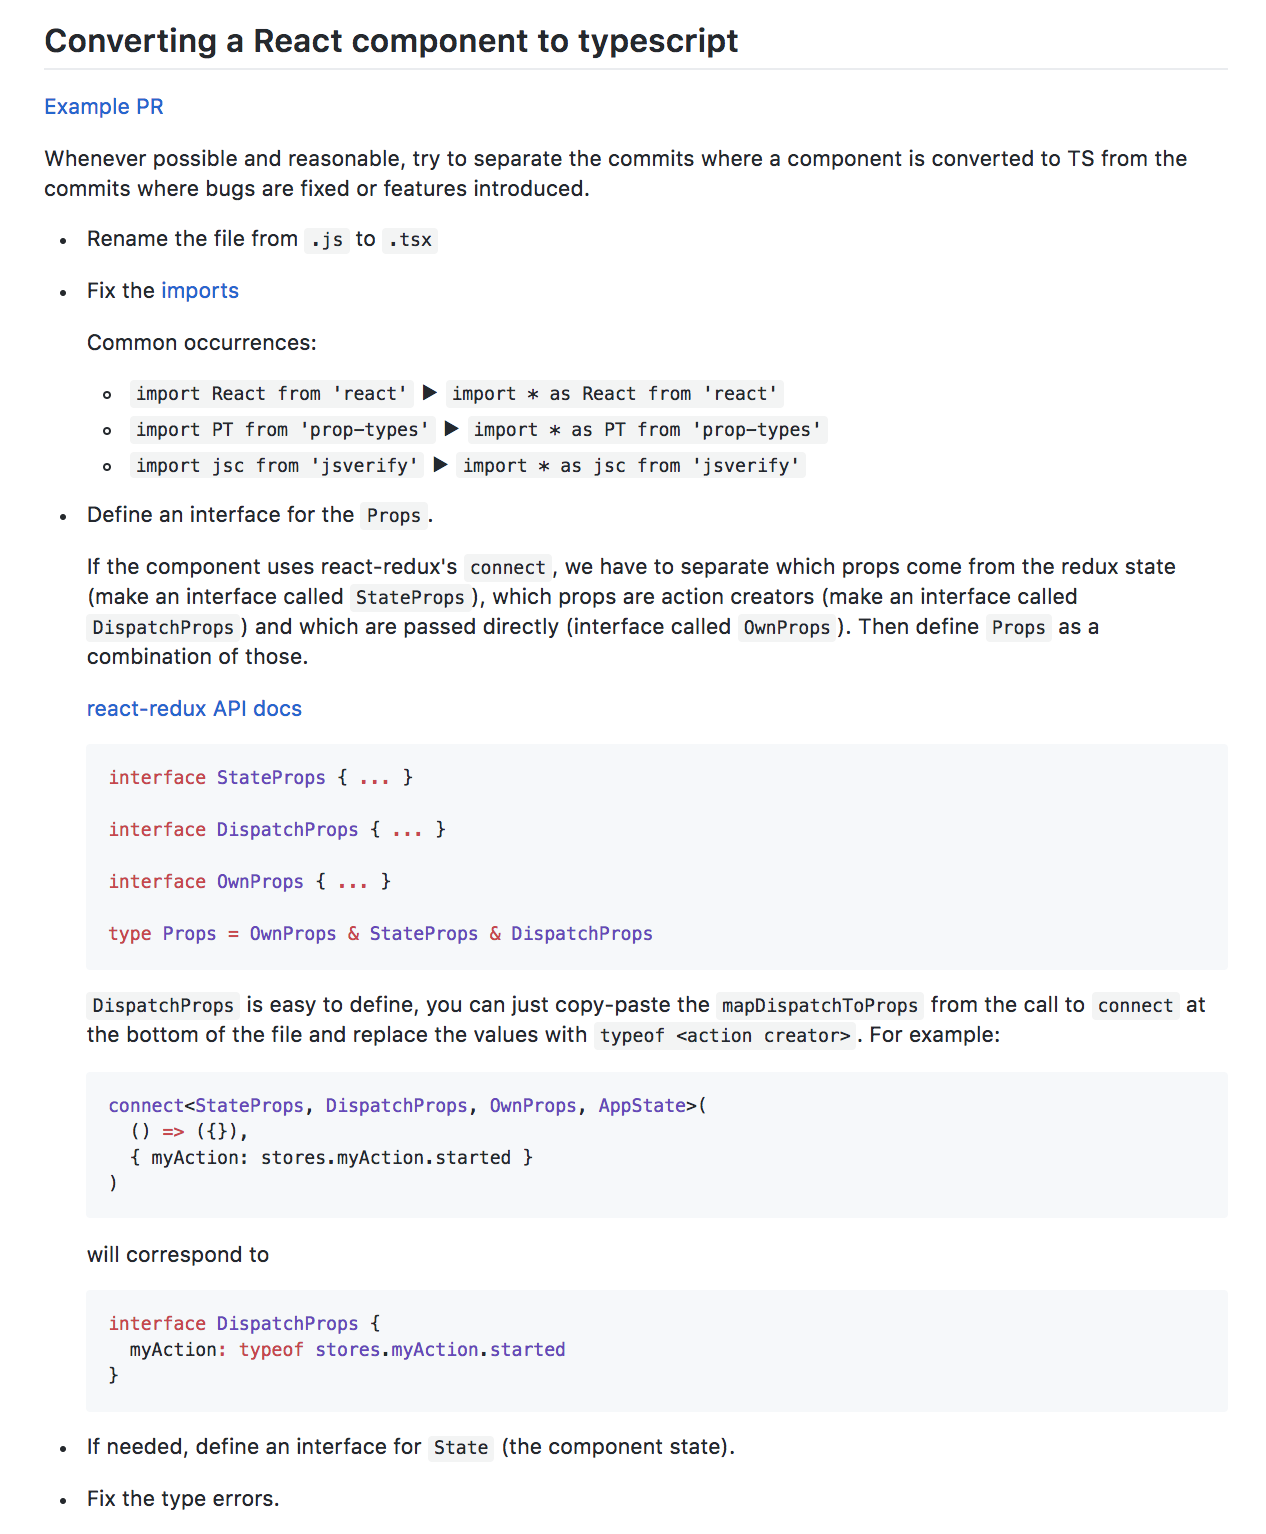 Typescript to Javacript conversion documentation.